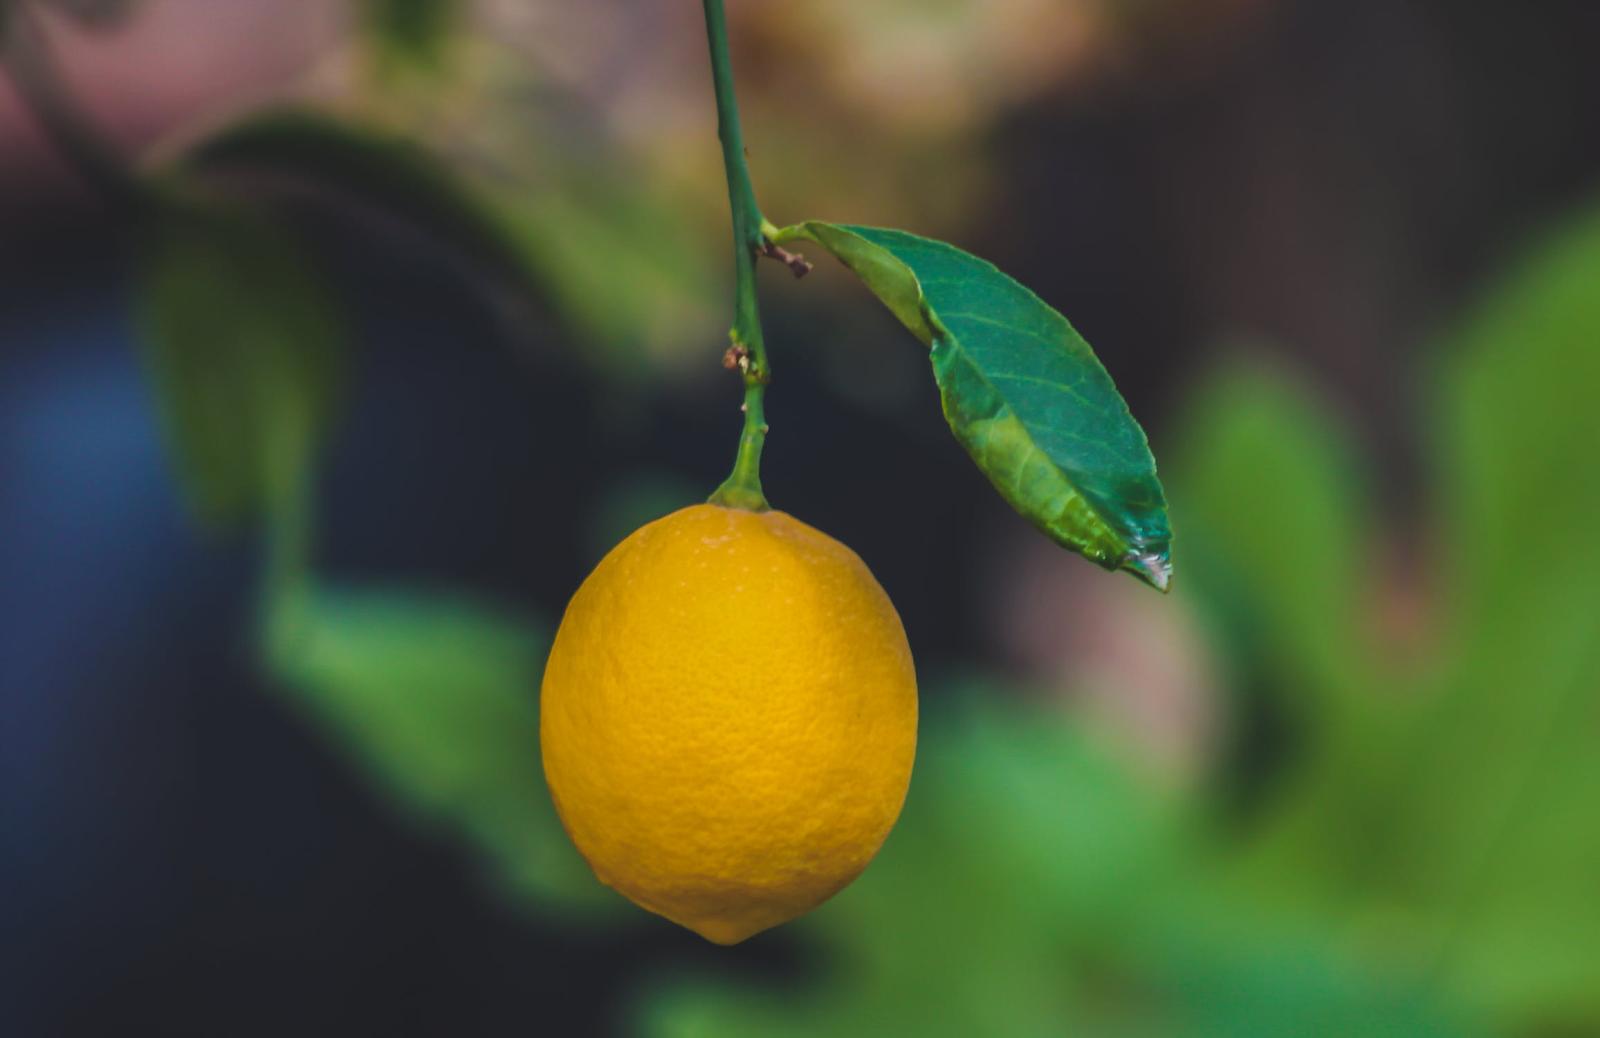 Lemon image.png